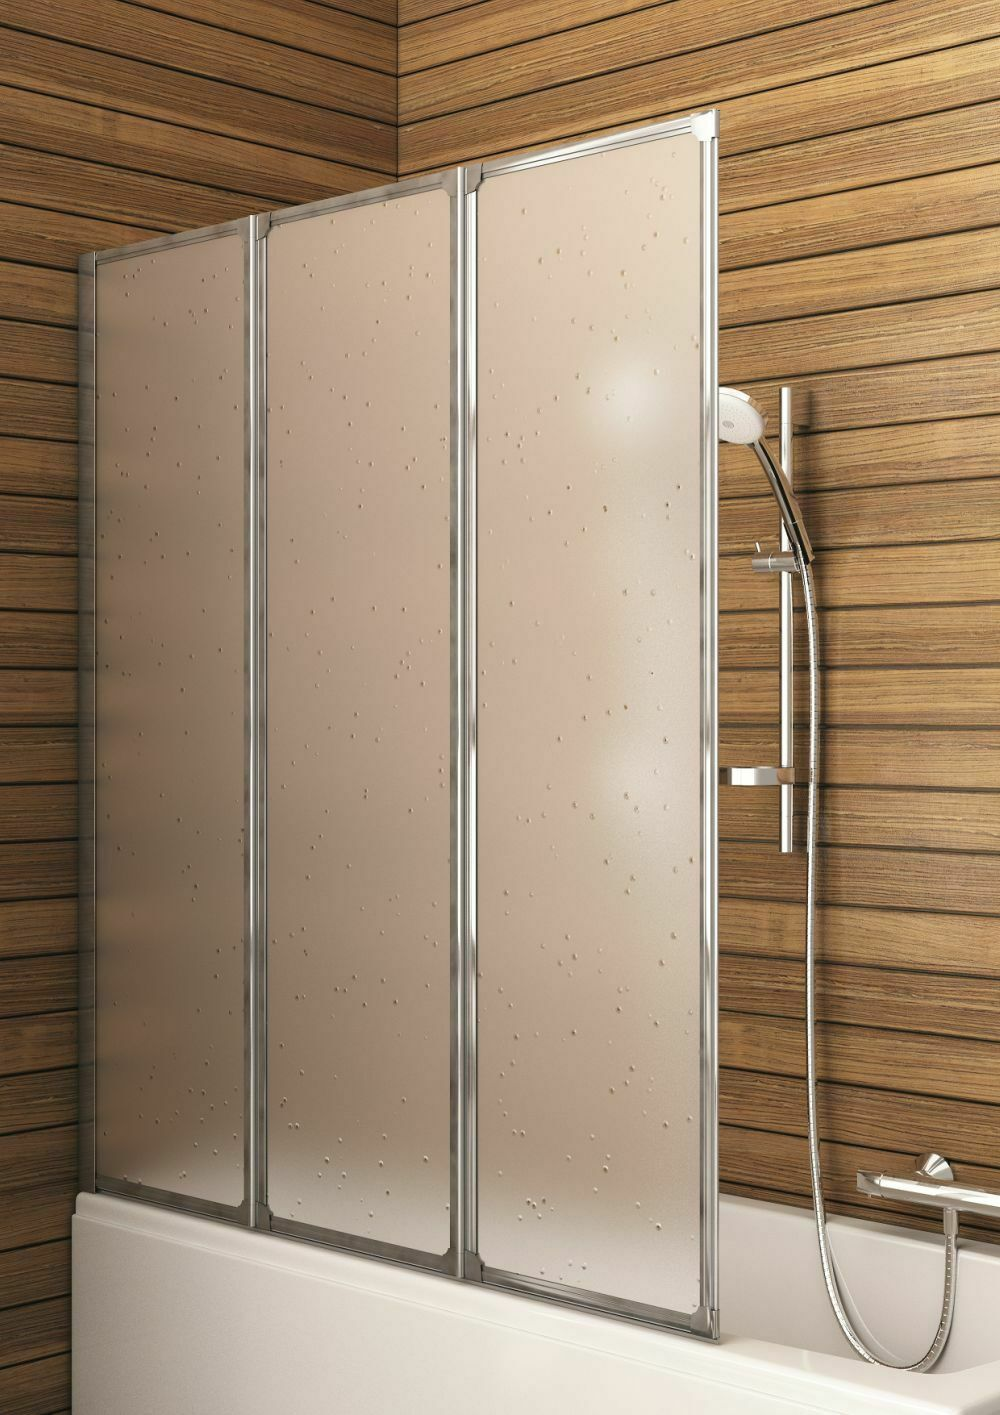 Aquaform Badewannenfaltwand 3-tlg Faltwand Badewannenaufsatz 120x140 Duschwand